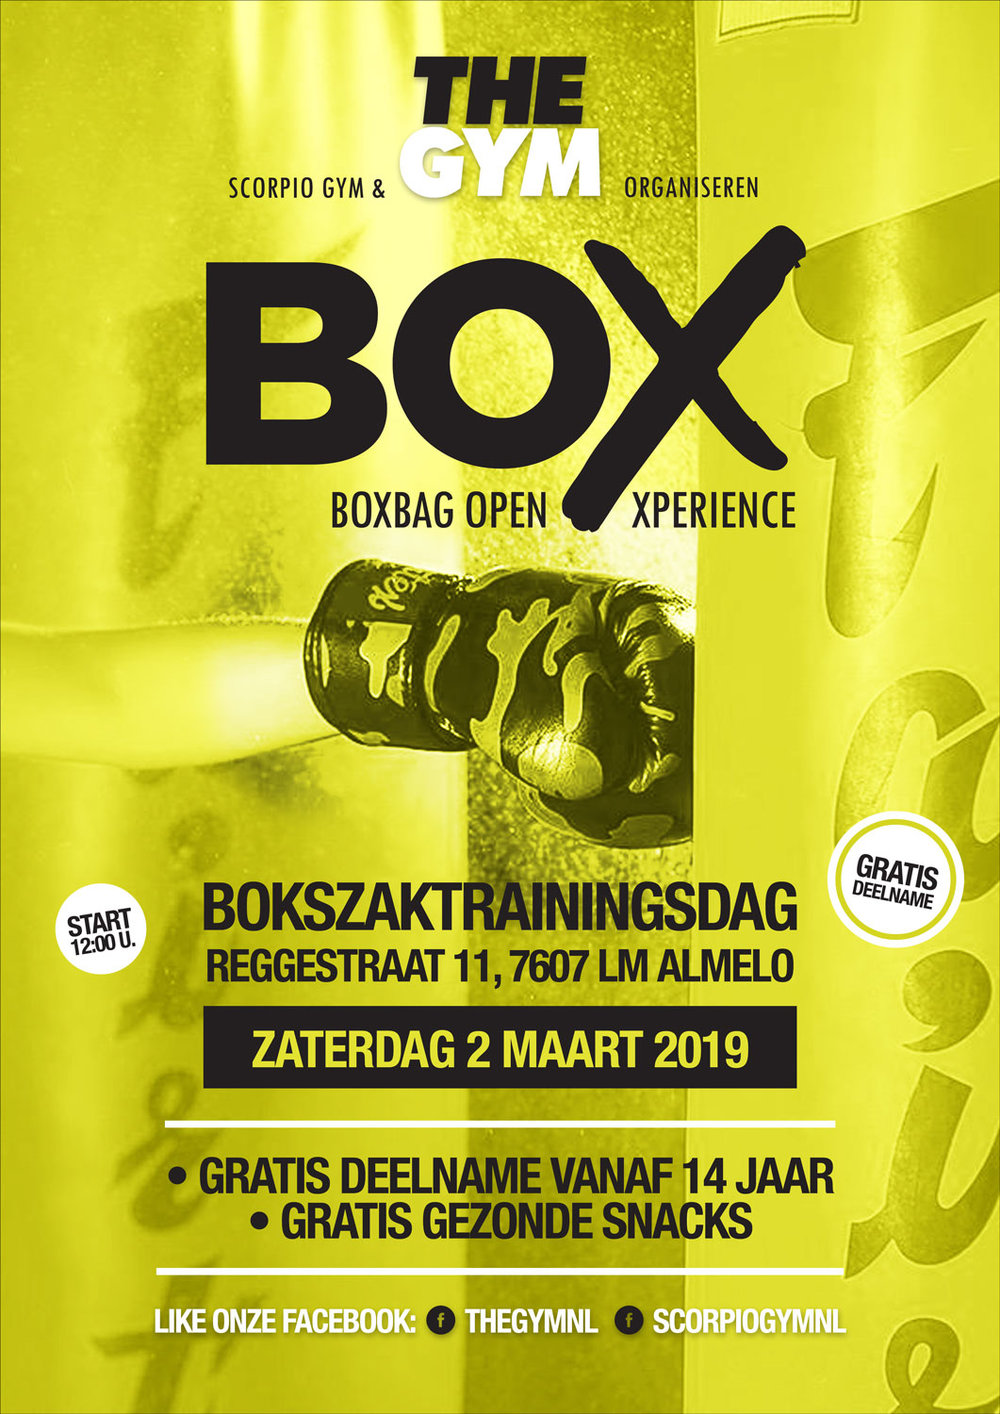 Boxbag-Open-Xperience .jpg